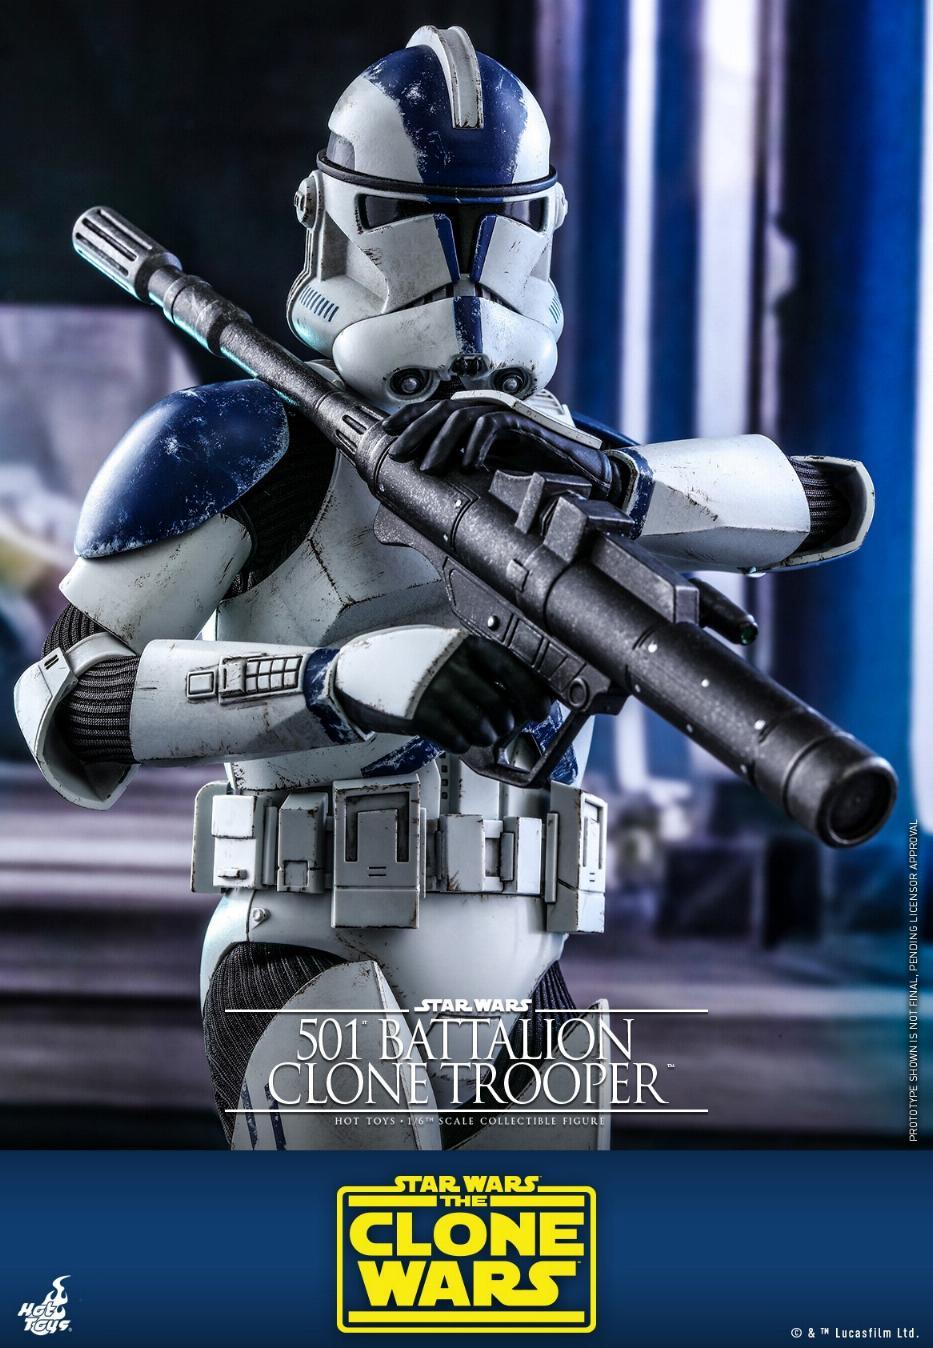 501st Battalion Clone Trooper - The Clone Wars - Hot Toys 0145